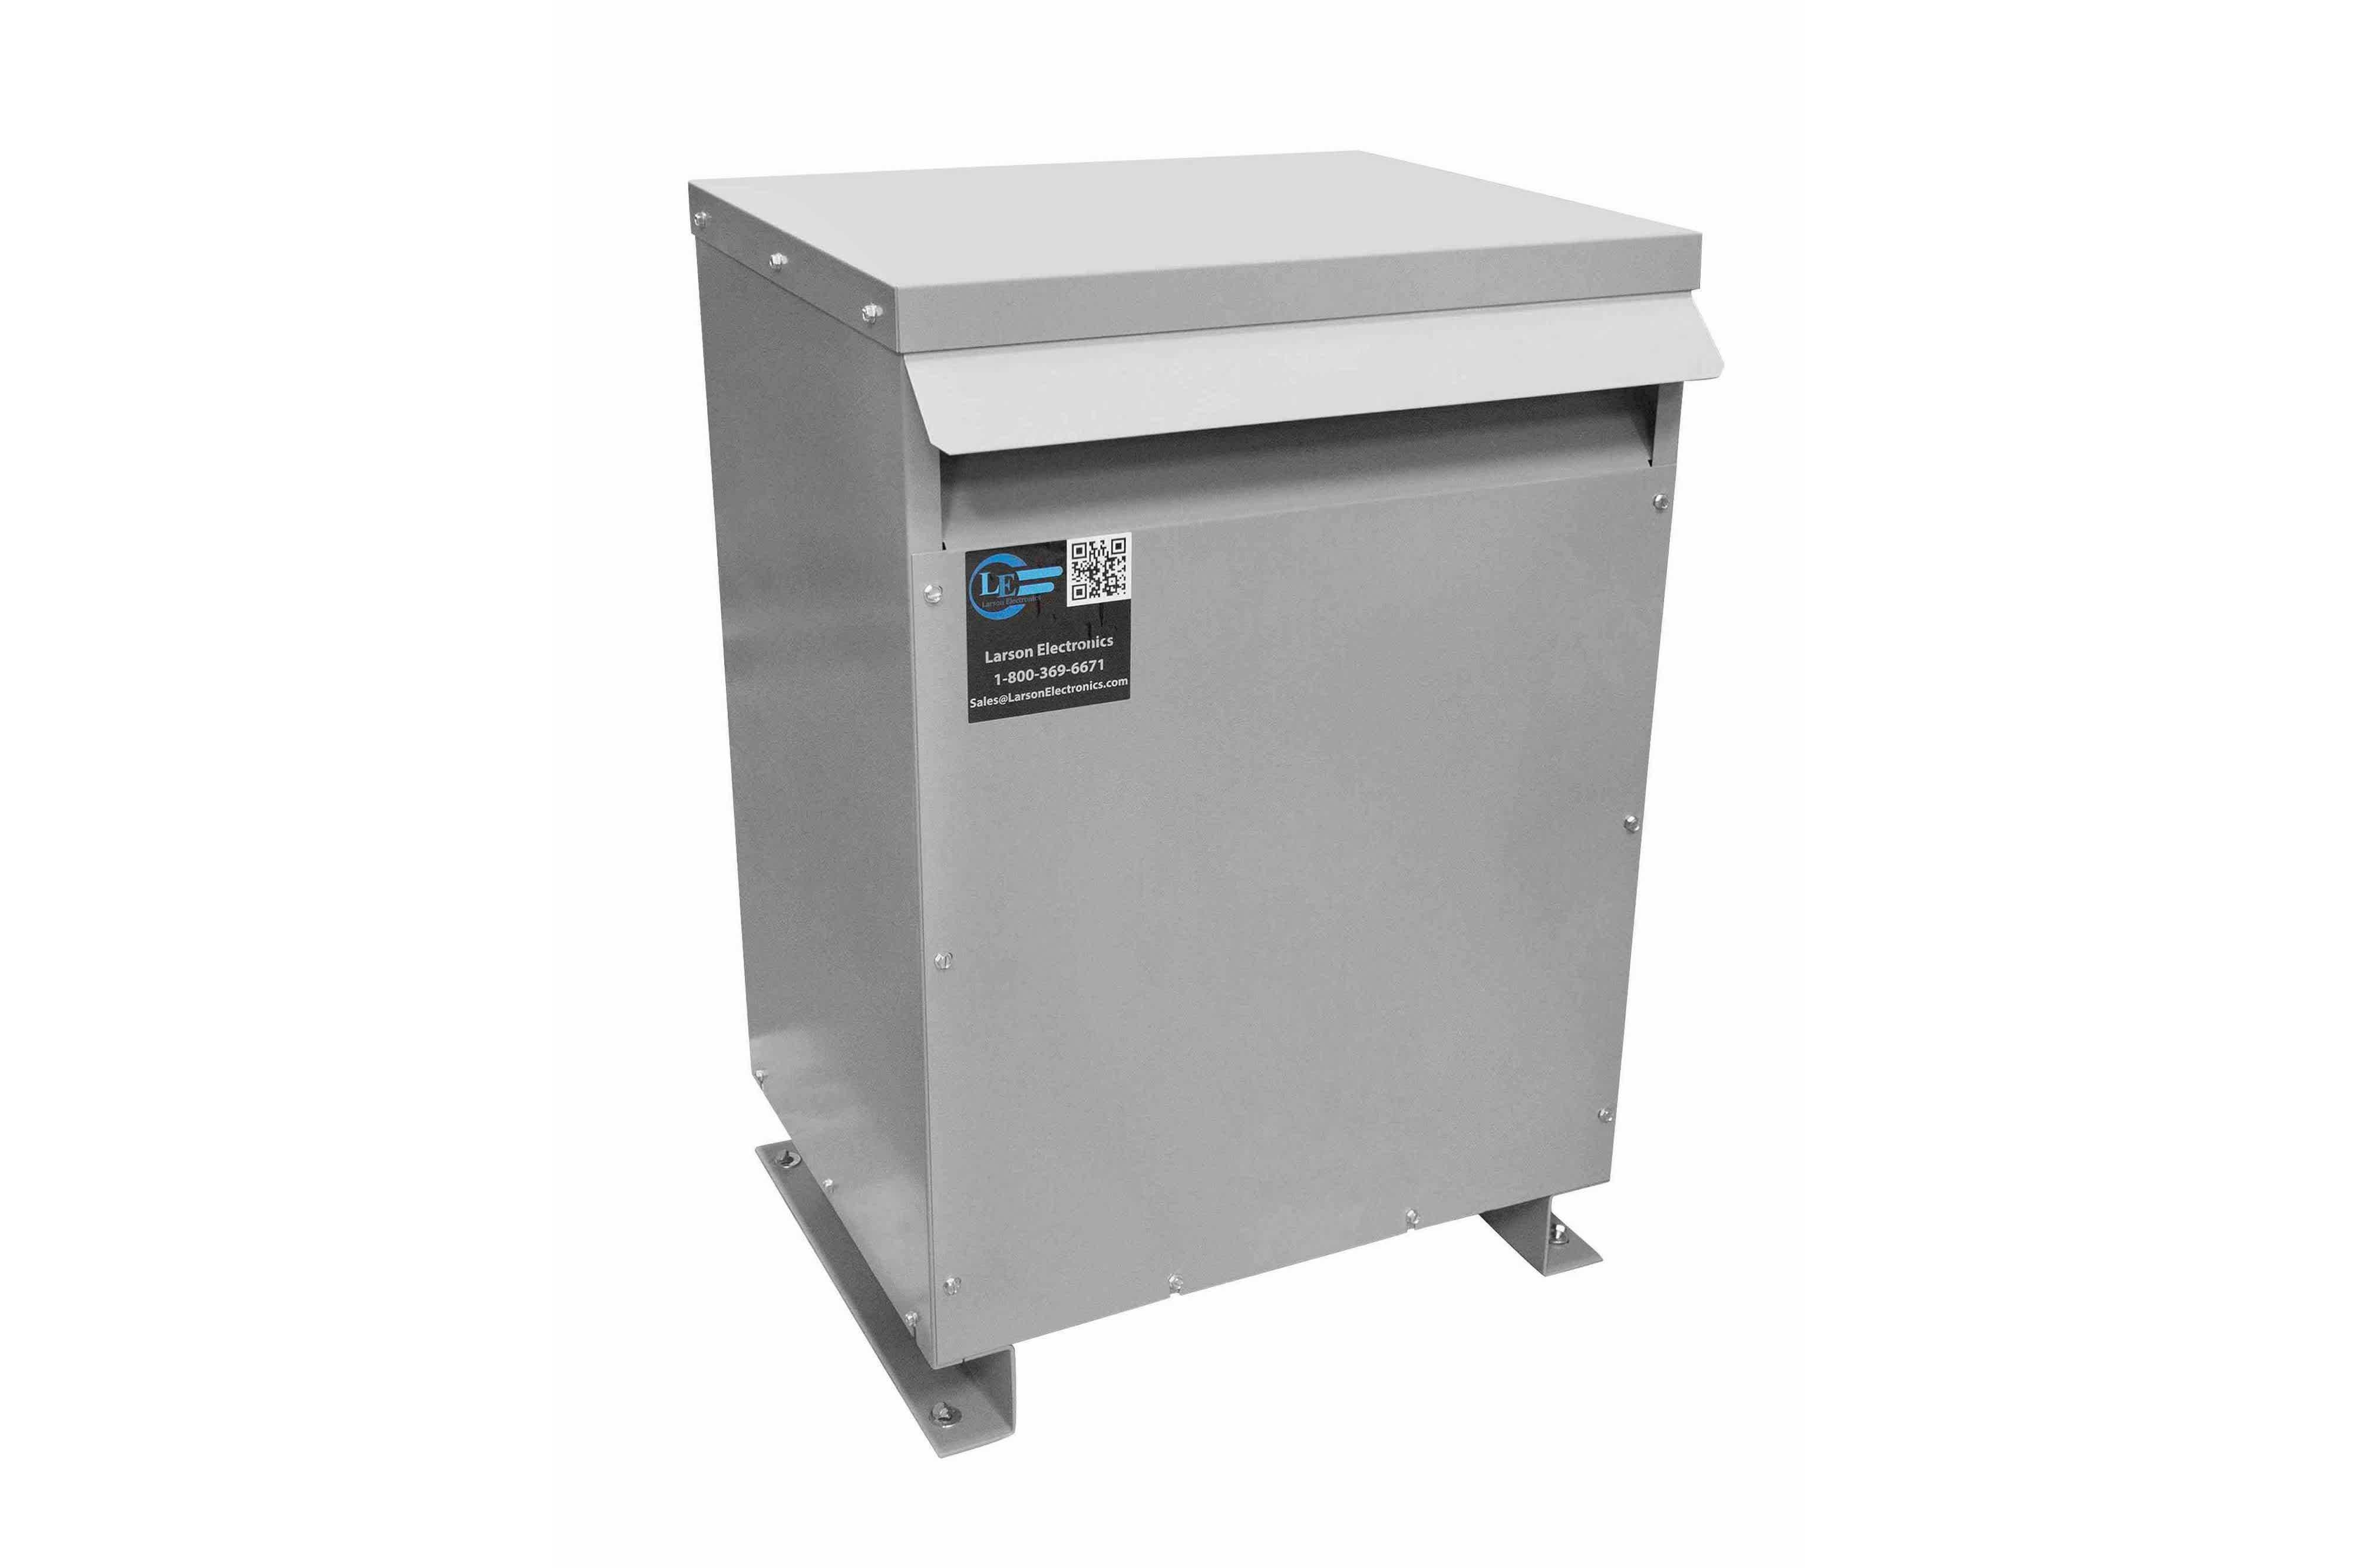 75 kVA 3PH Isolation Transformer, 480V Wye Primary, 240V Delta Secondary, N3R, Ventilated, 60 Hz